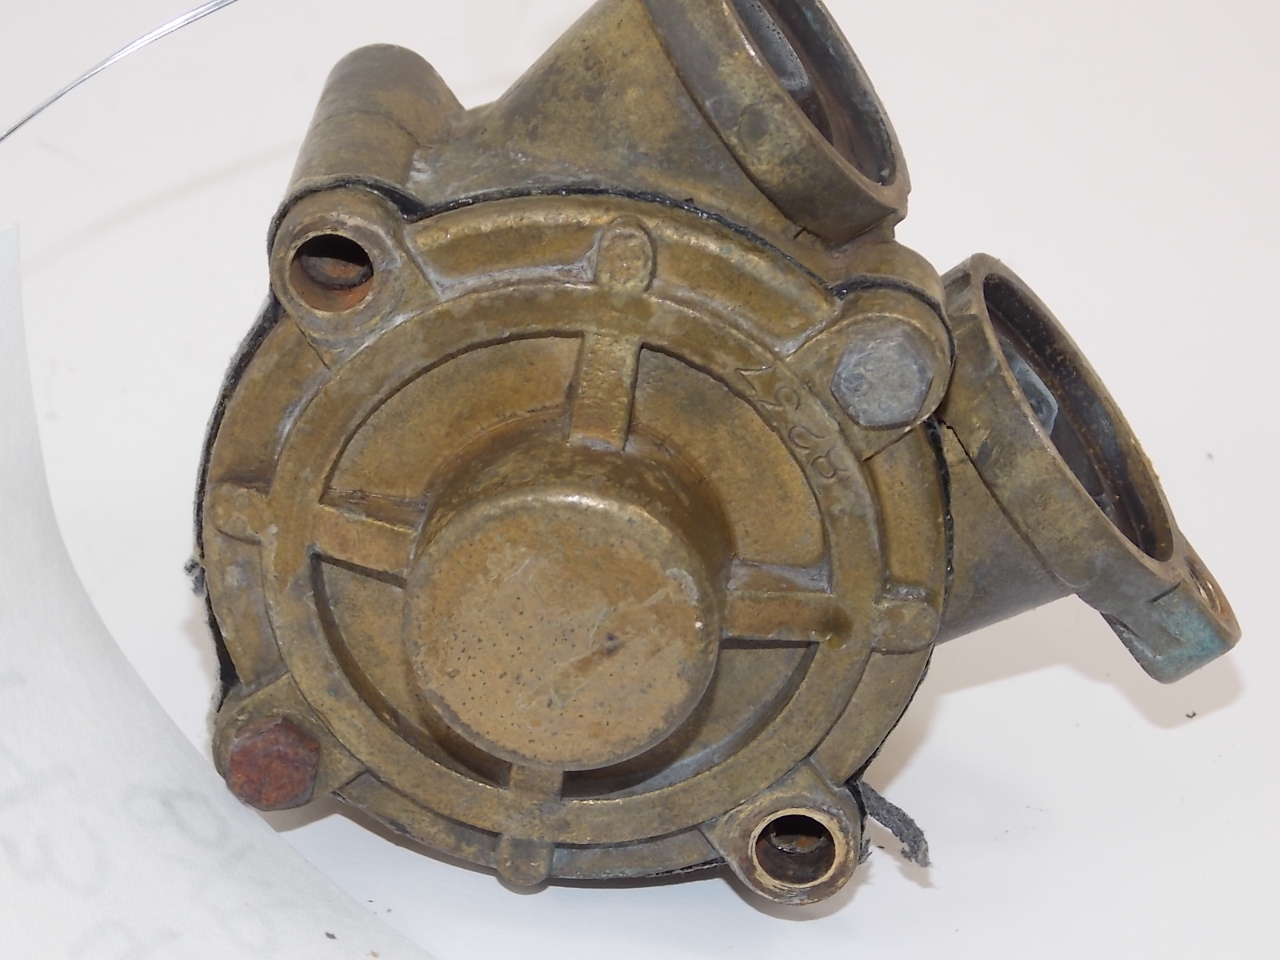 Aq125a 1984 Volvo Penta Engine Diagram Wiring Choke